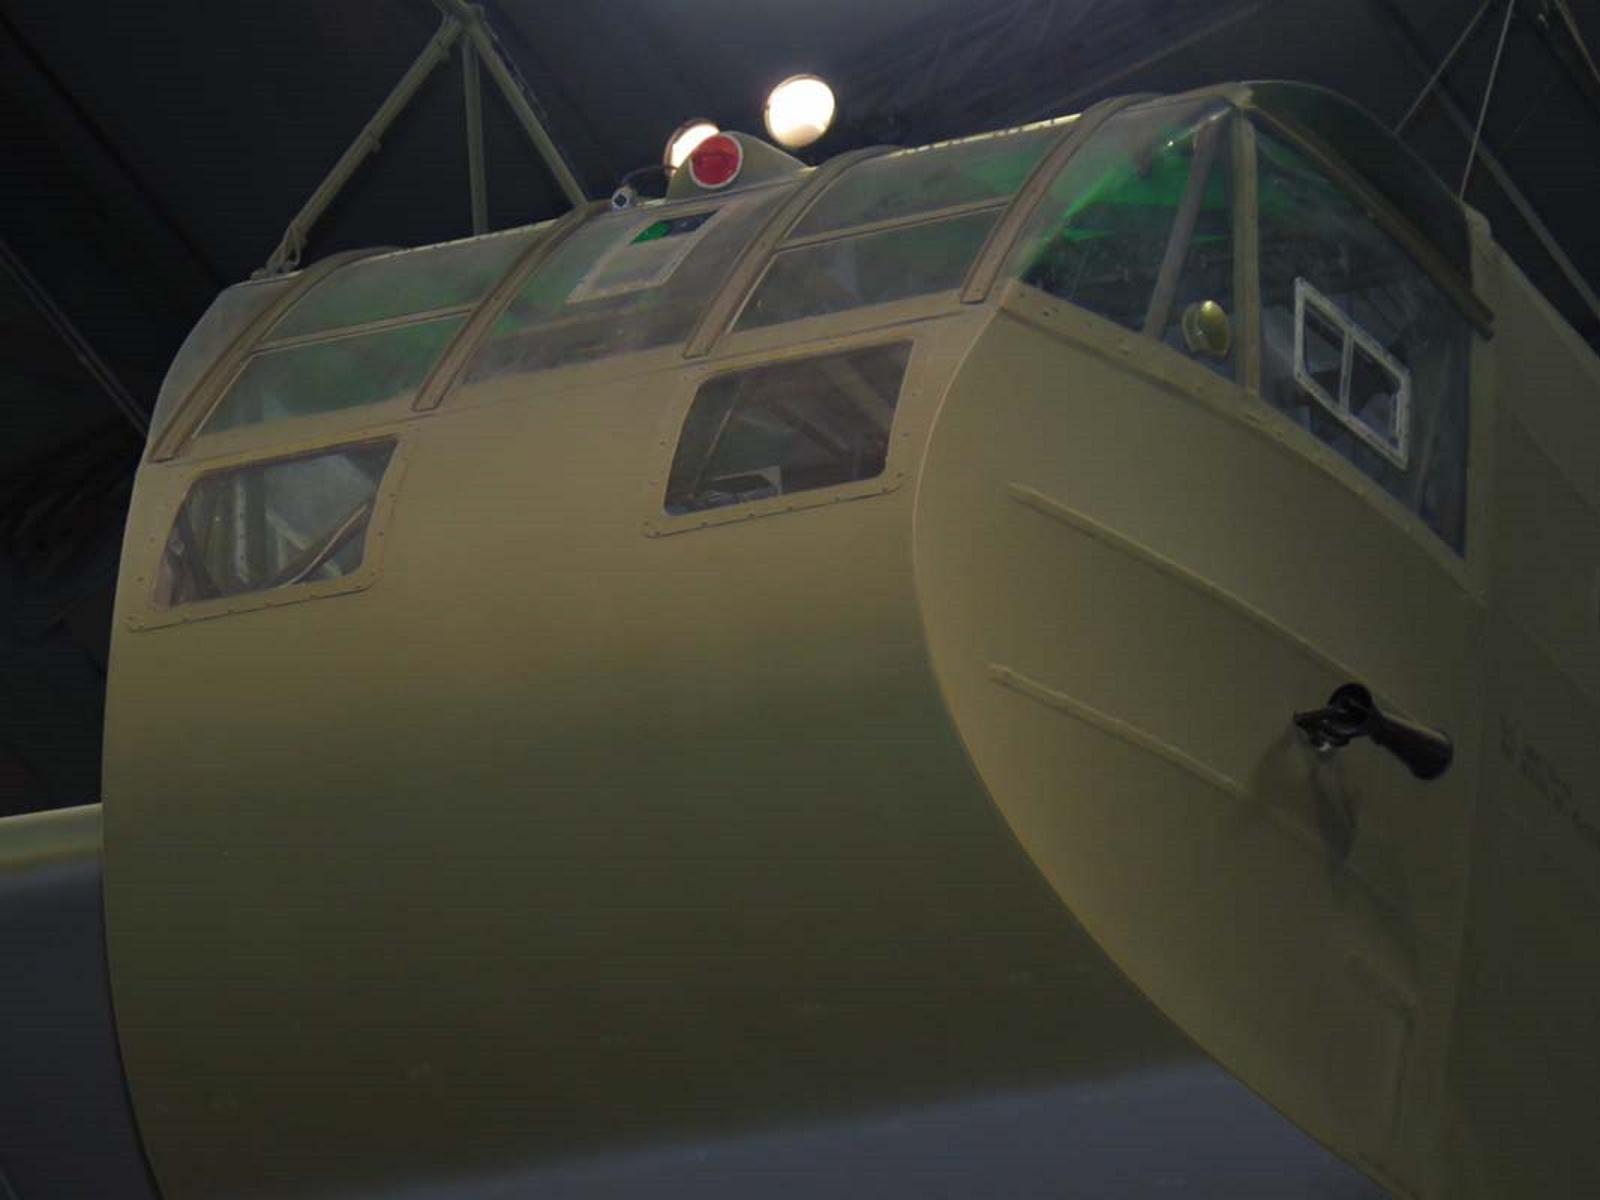 WACO CG-4A 헤이그